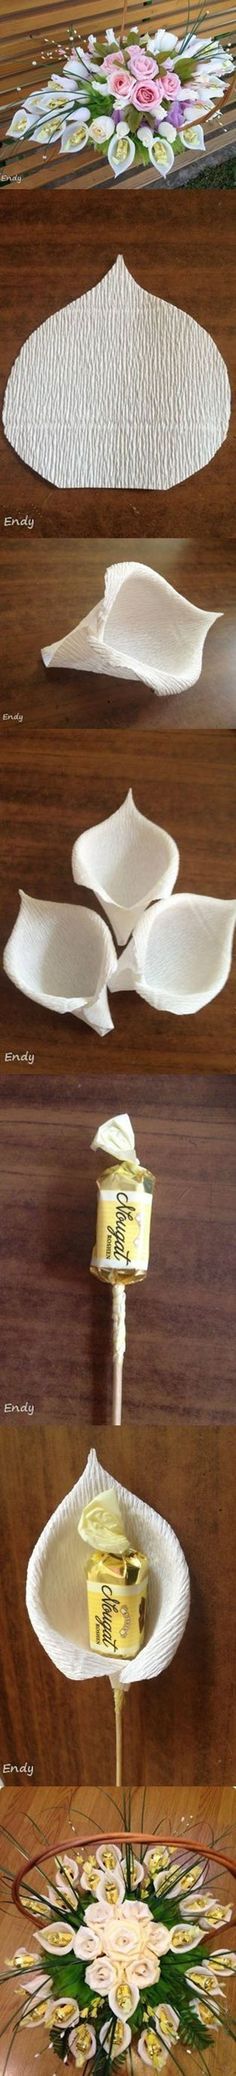 17 flower bouquet tutorialb07cd8876fe995 | DIY